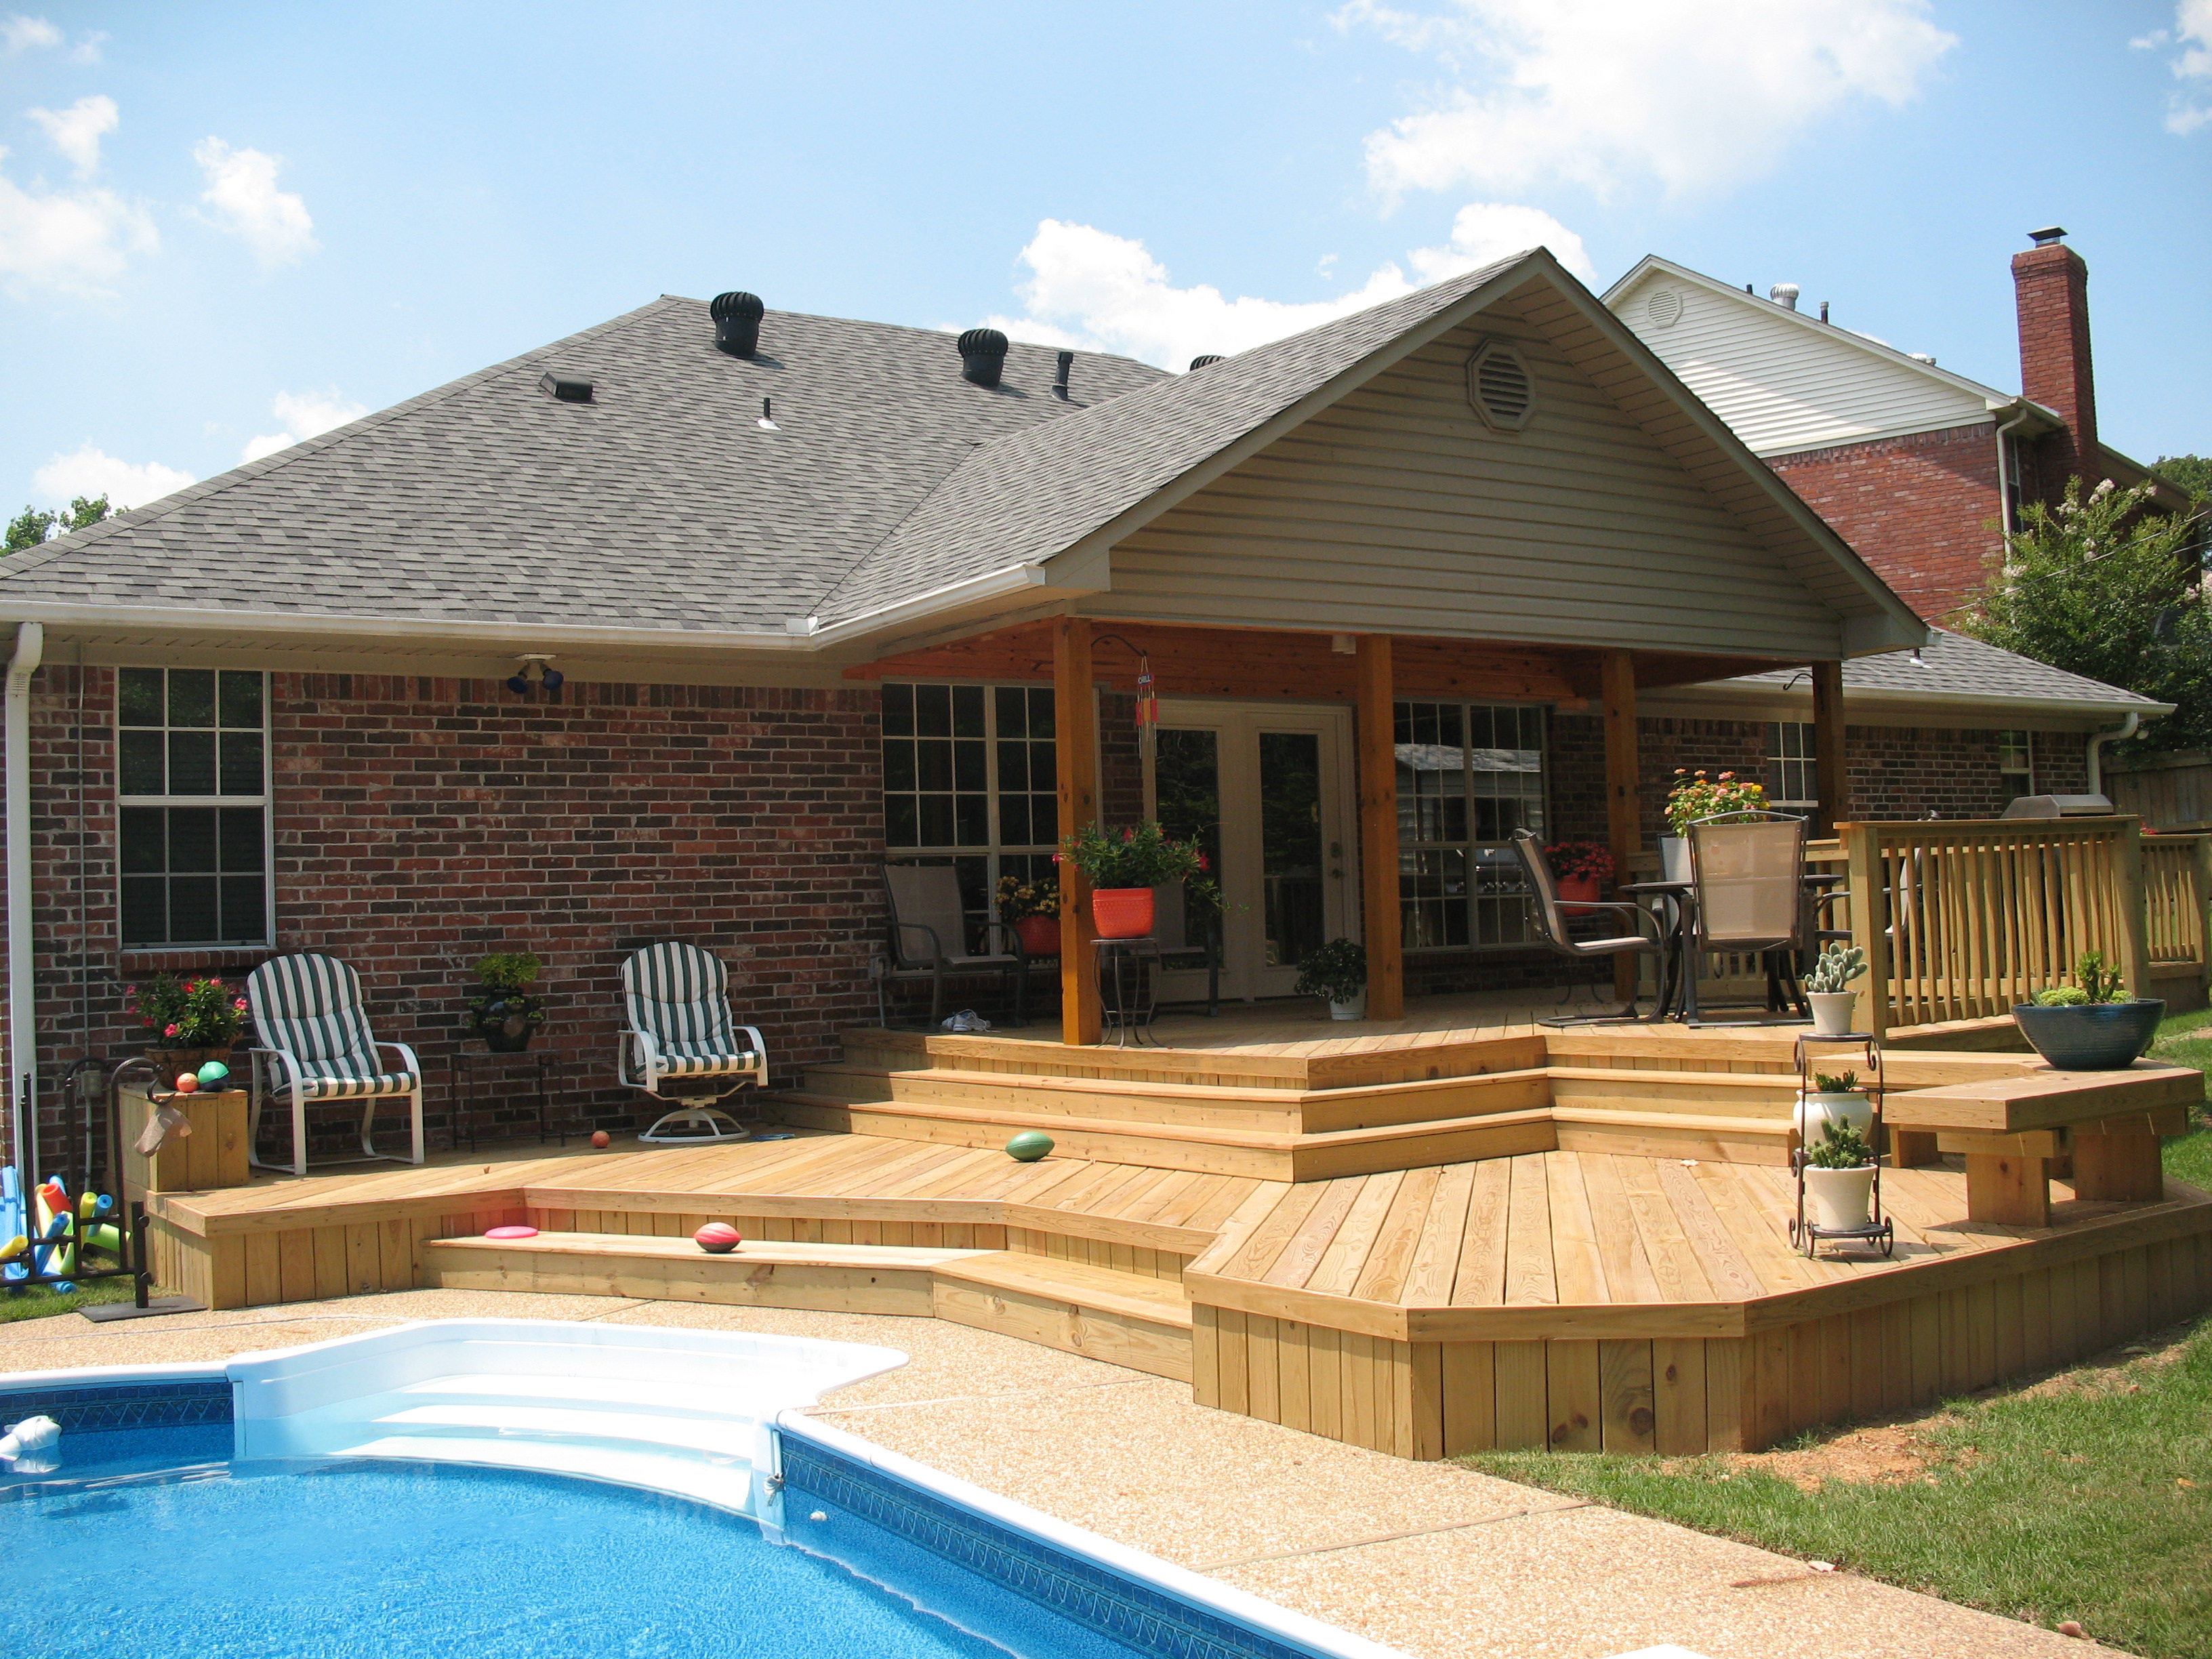 deck design ideas - Home Deck Design